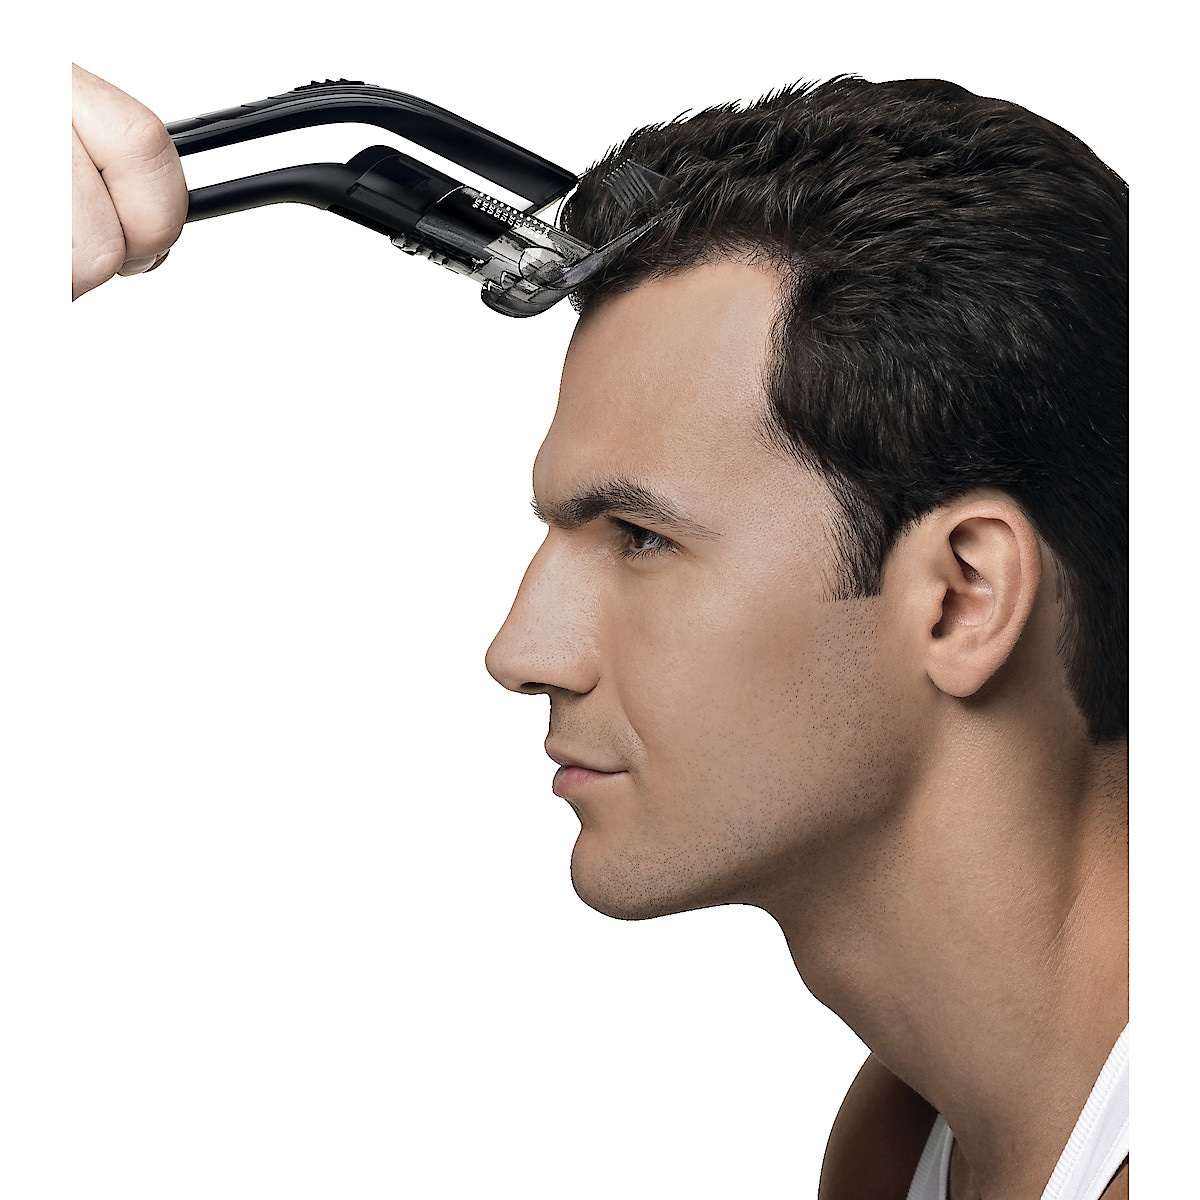 Philips QC5115/15 hårklipper